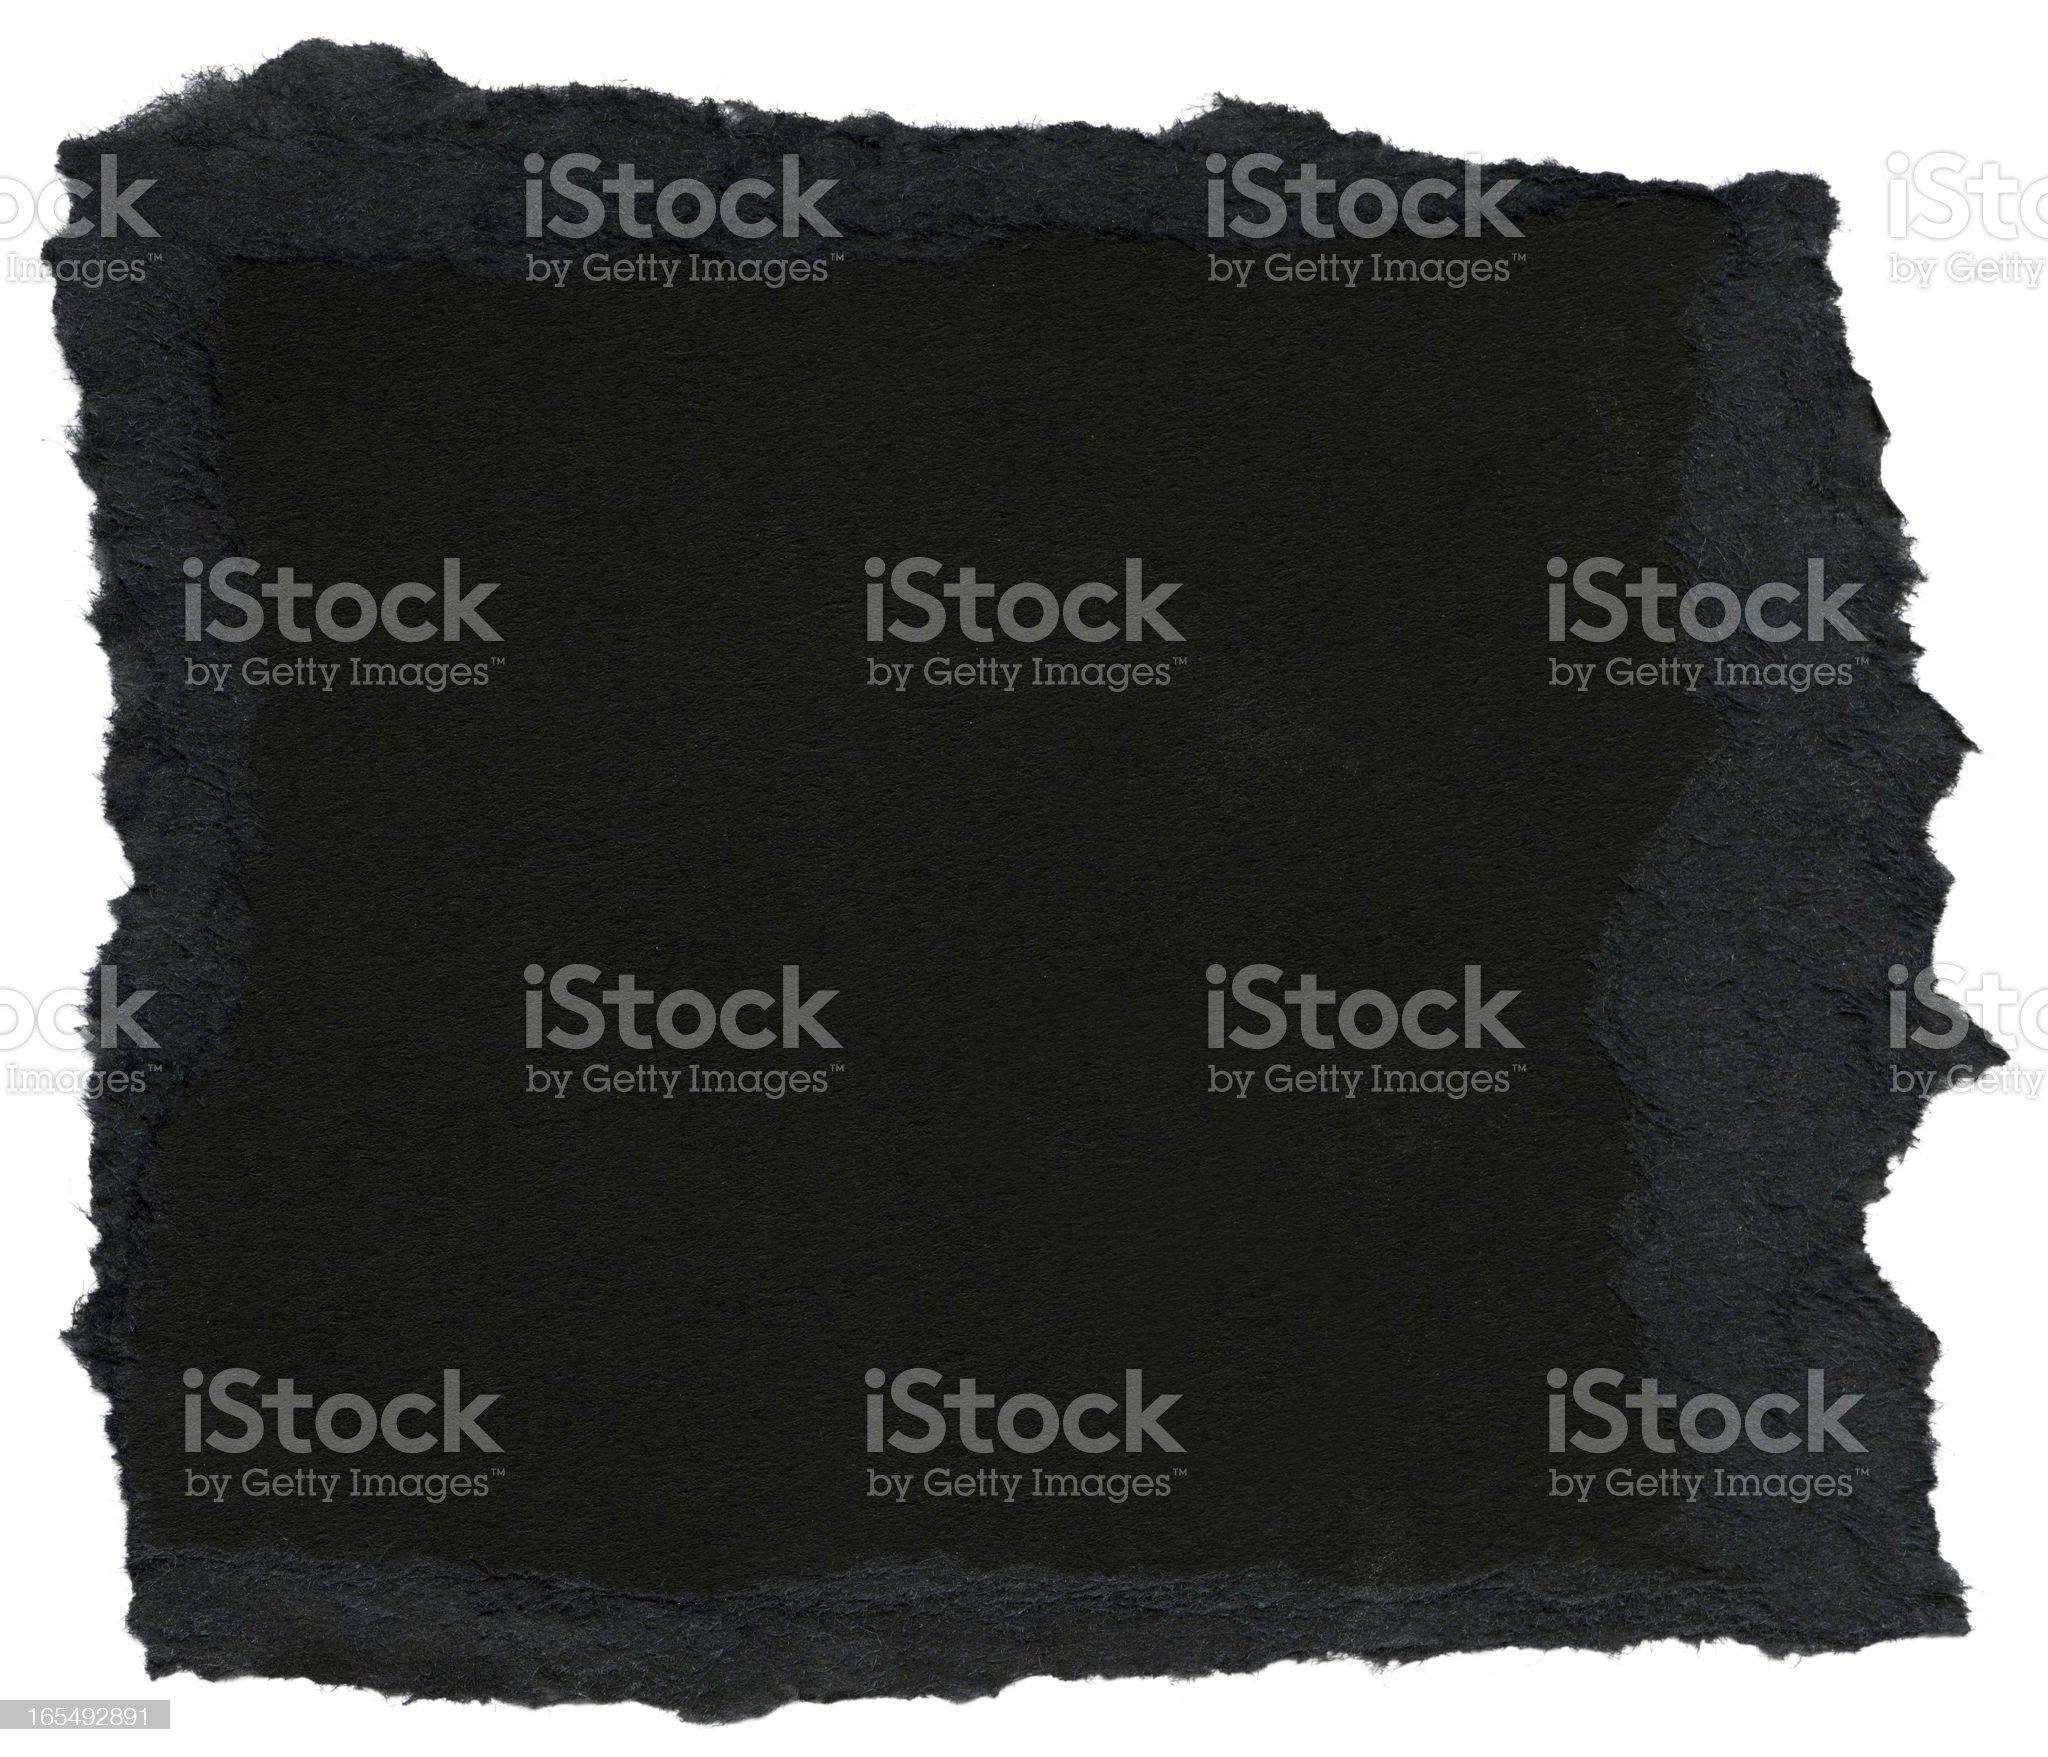 Fiber Paper Texture - Black with Torn Edges XXXXL royalty-free stock photo